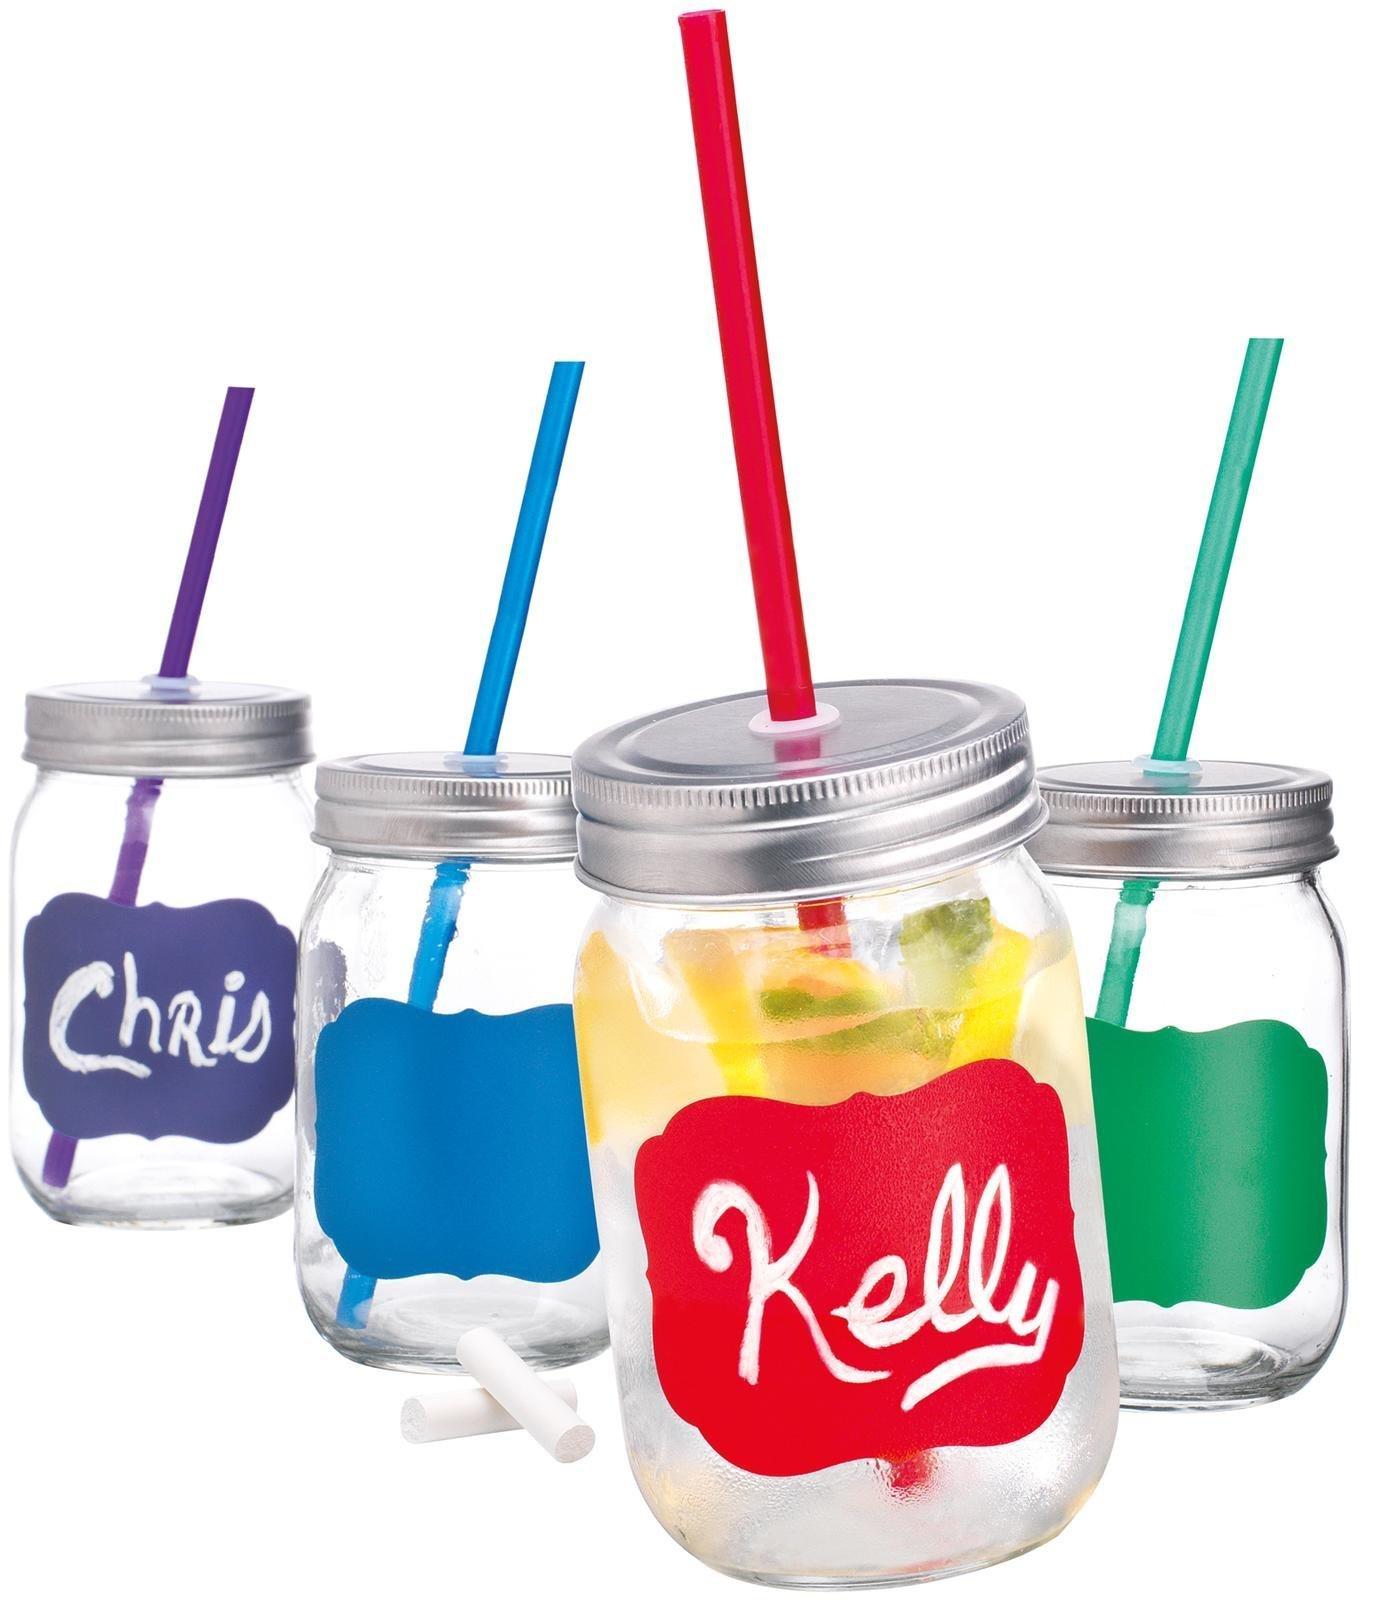 Home Essentials Chalk It 15 oz Mason Jars, Set of 4 (Assorted)